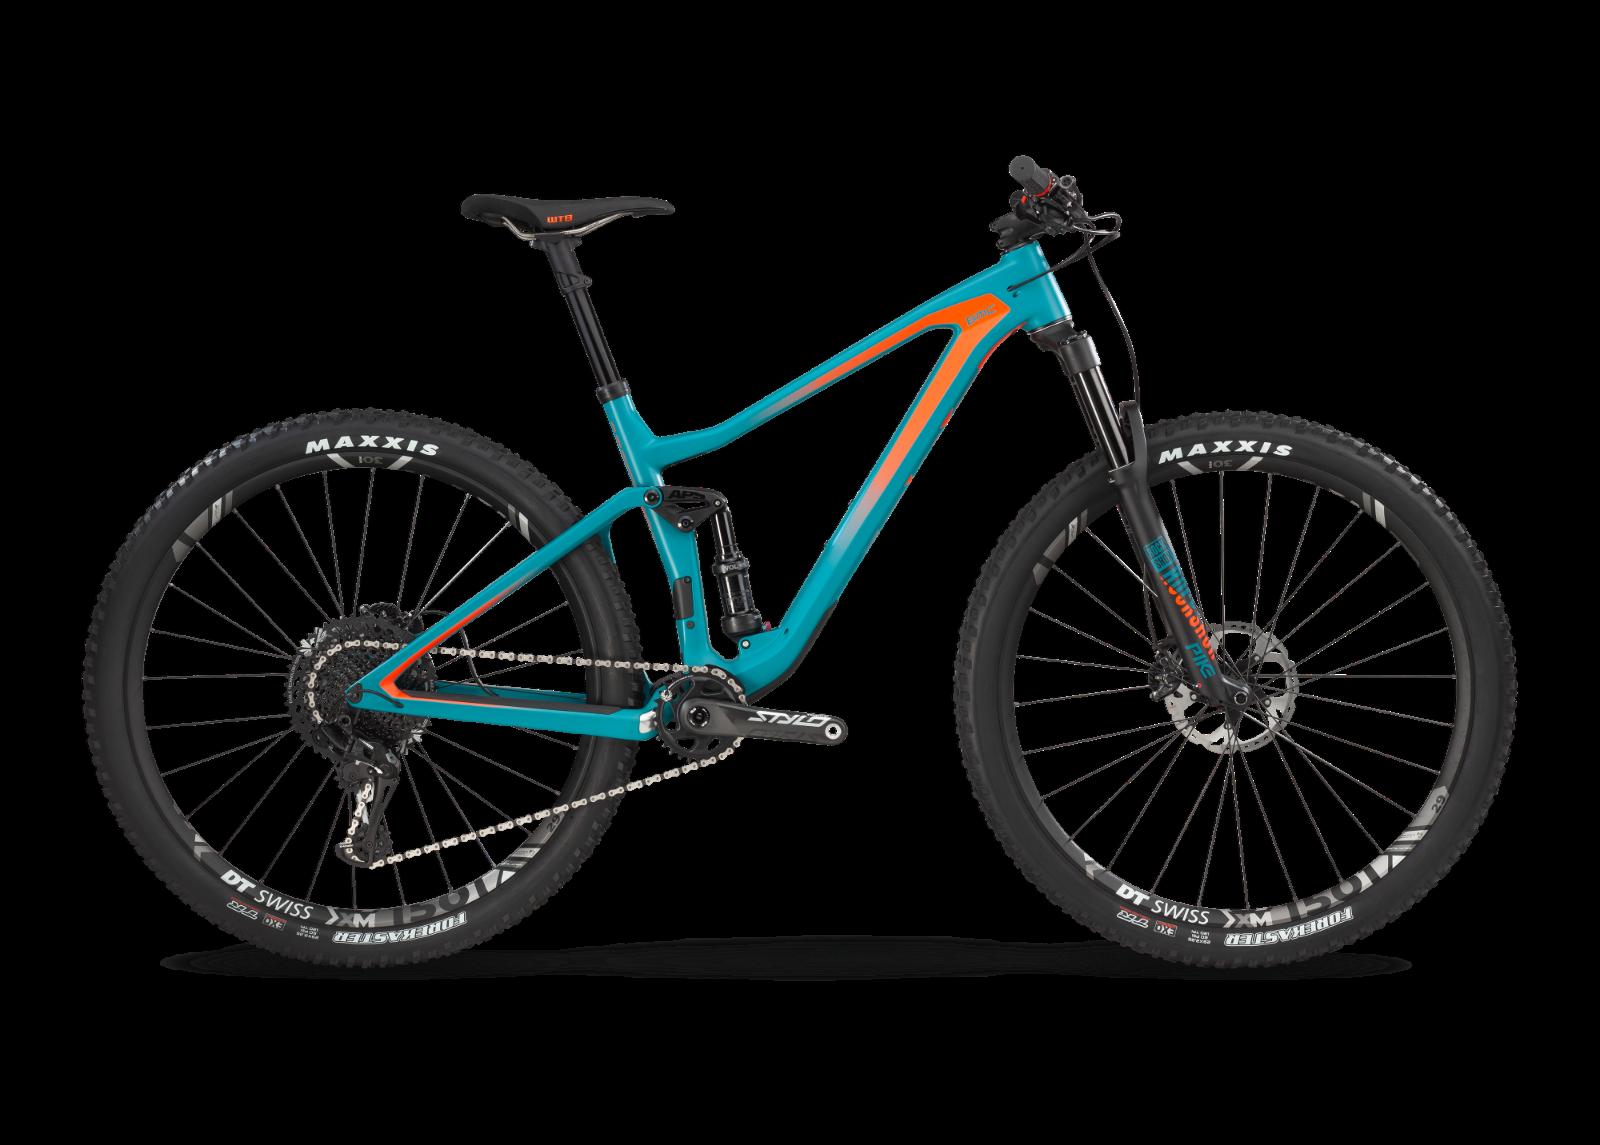 2019 Bmc Speedfox 01 One Mountain Bike Large Retail 6500